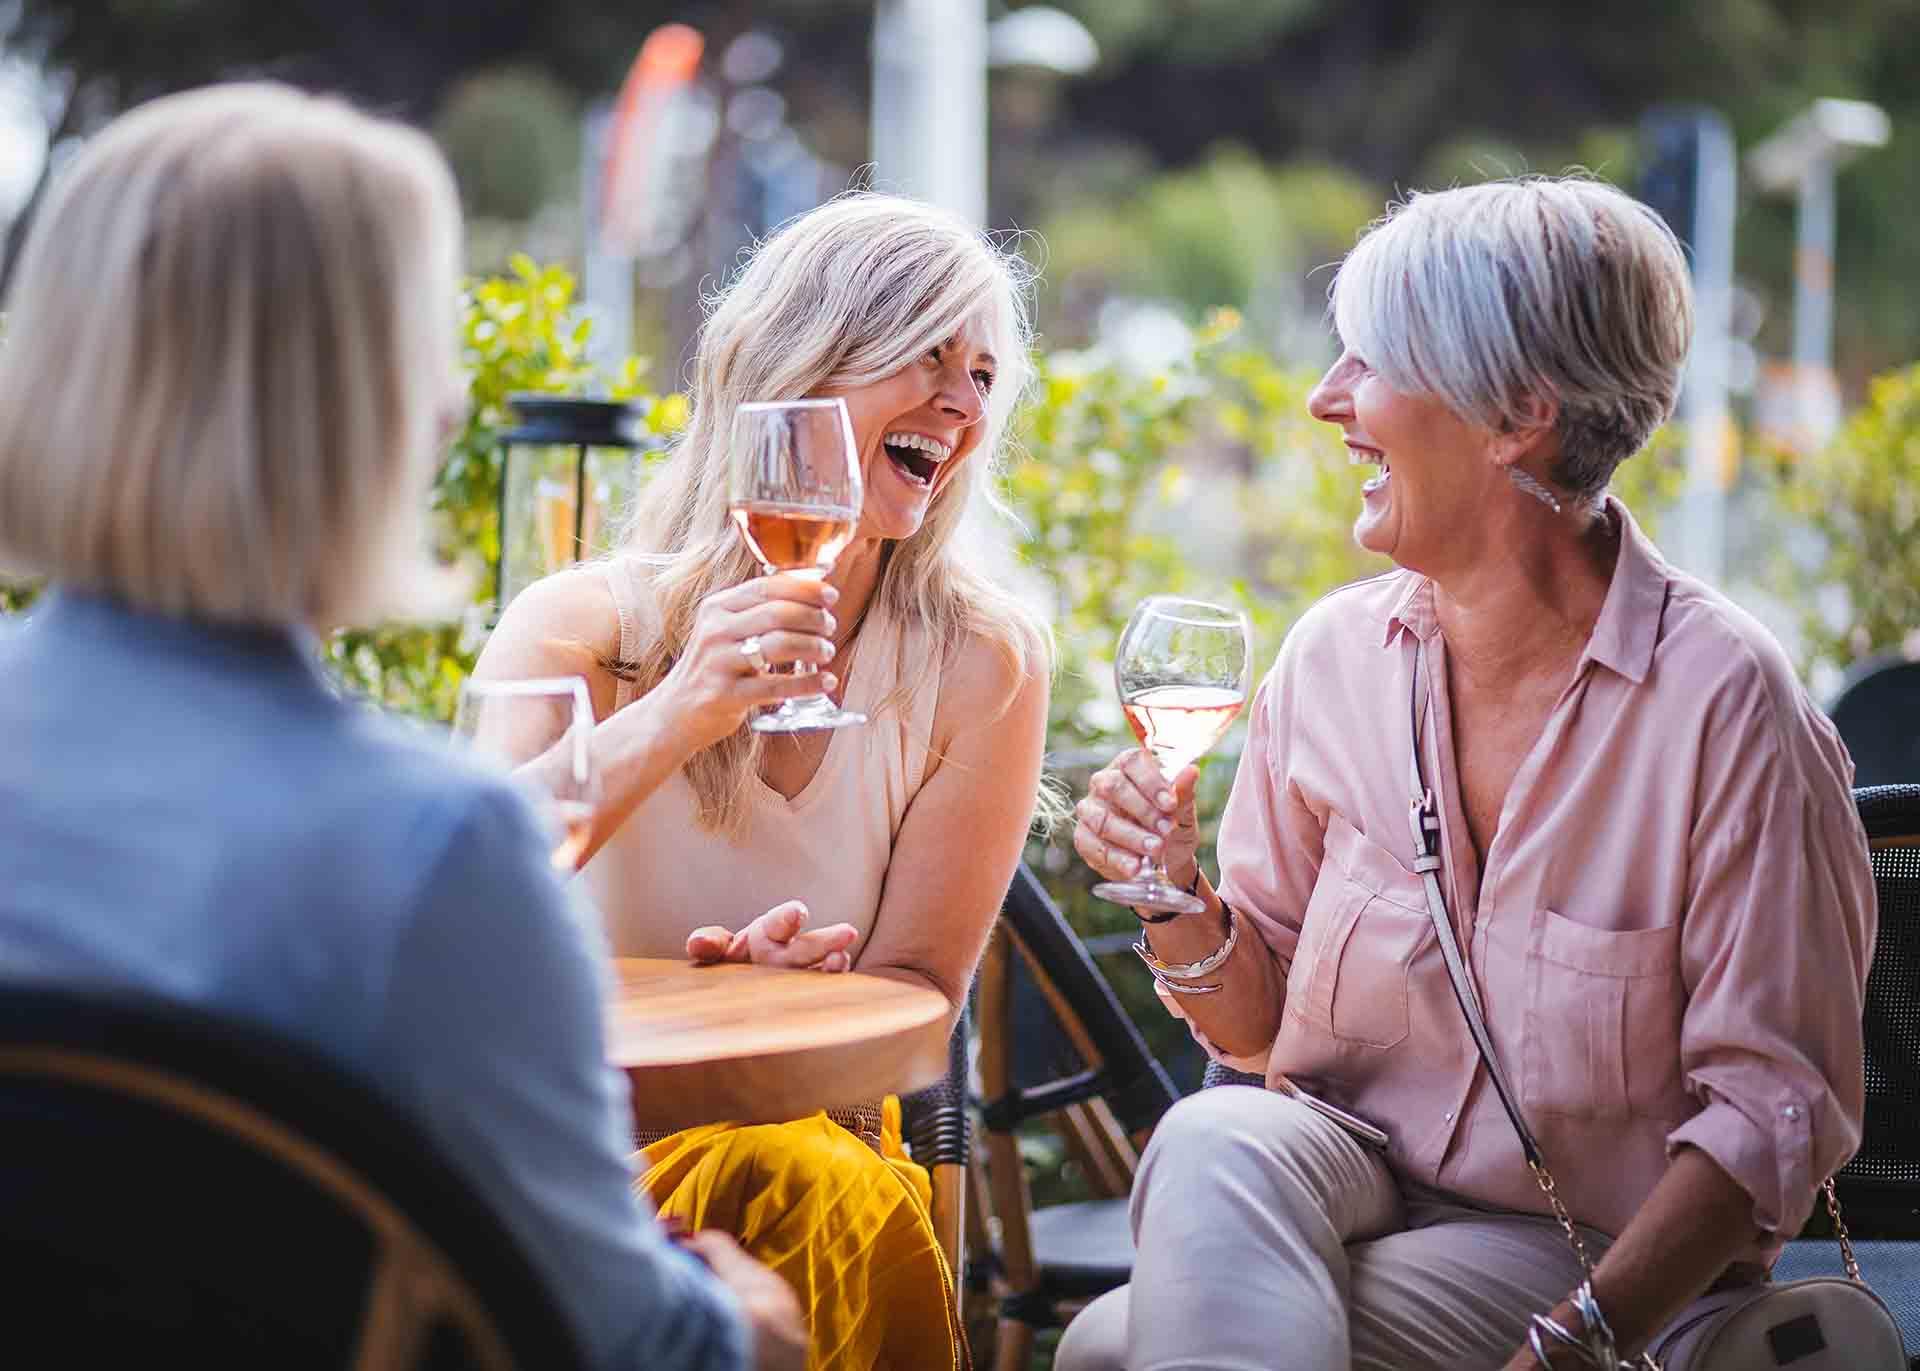 Friends enjoying wine together in Florida